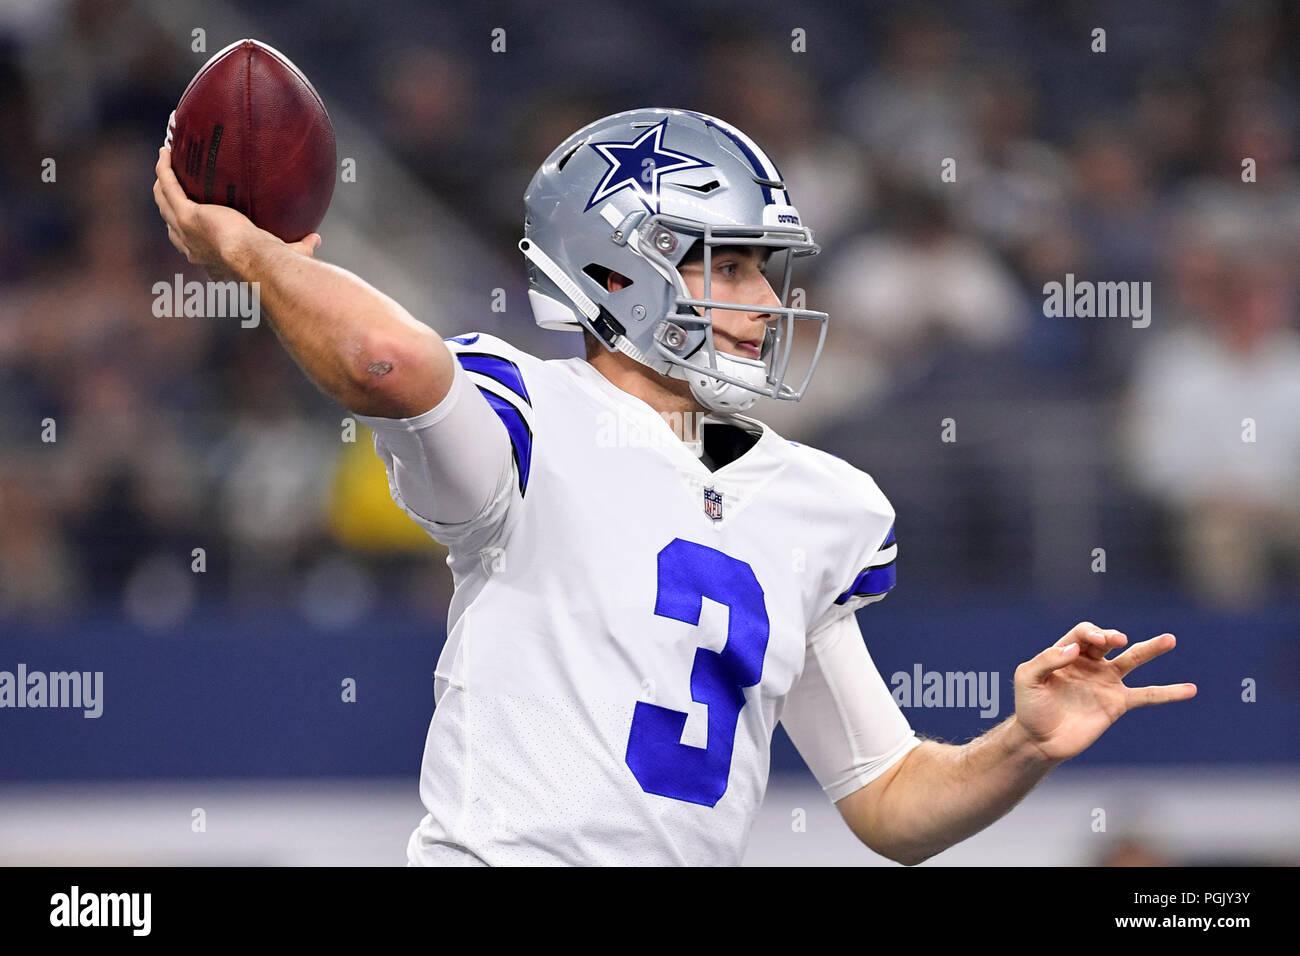 on sale be8d0 ddc6c Dallas, Texas, USA. 26th Aug, 2018. August 26, 2018: Dallas ...